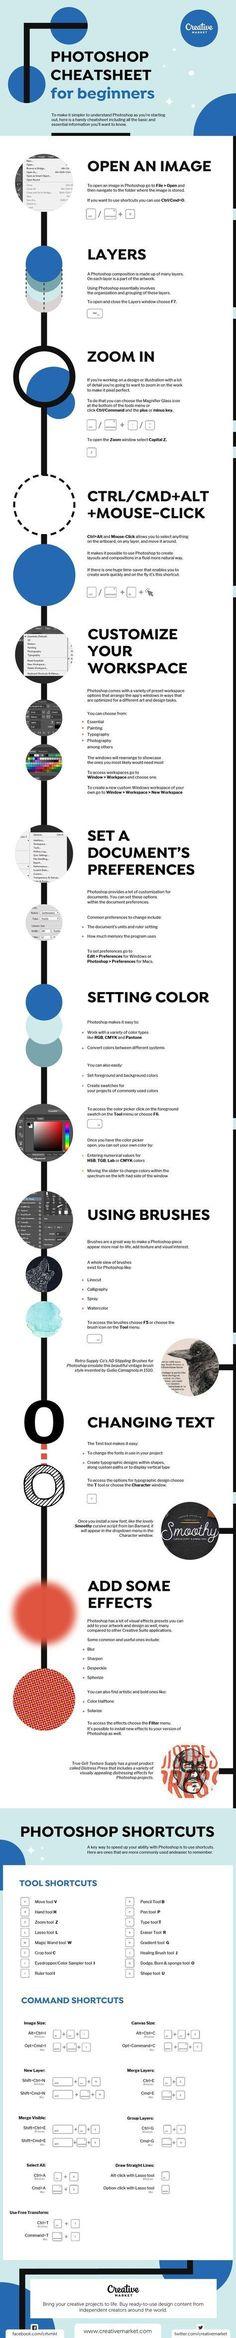 On the Creative Market Blog - Photoshop Cheatsheet for Beginners